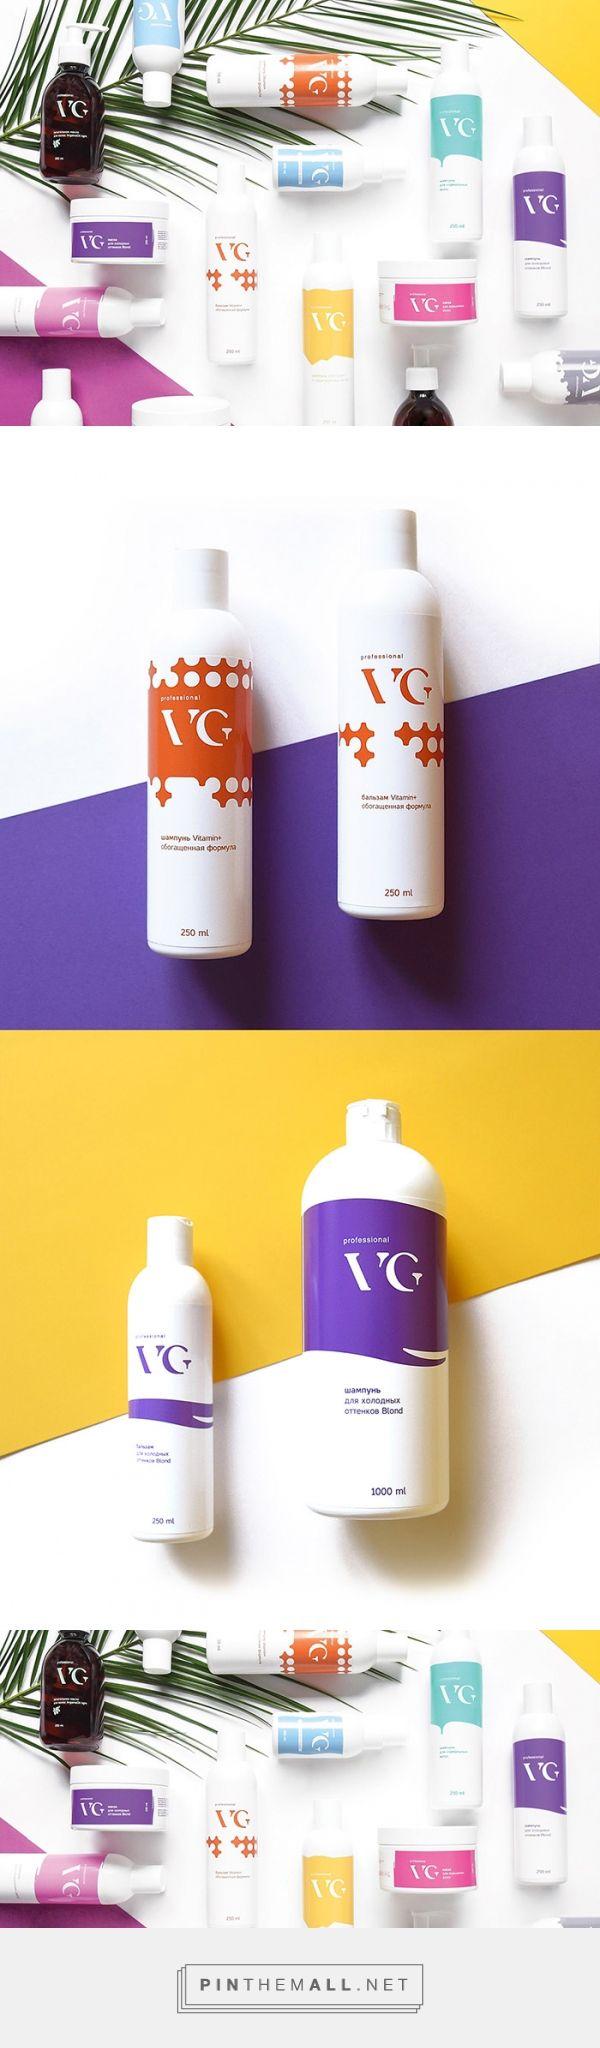 VG professional /  professional hair cosmetics / Designed by Yartceva Masha